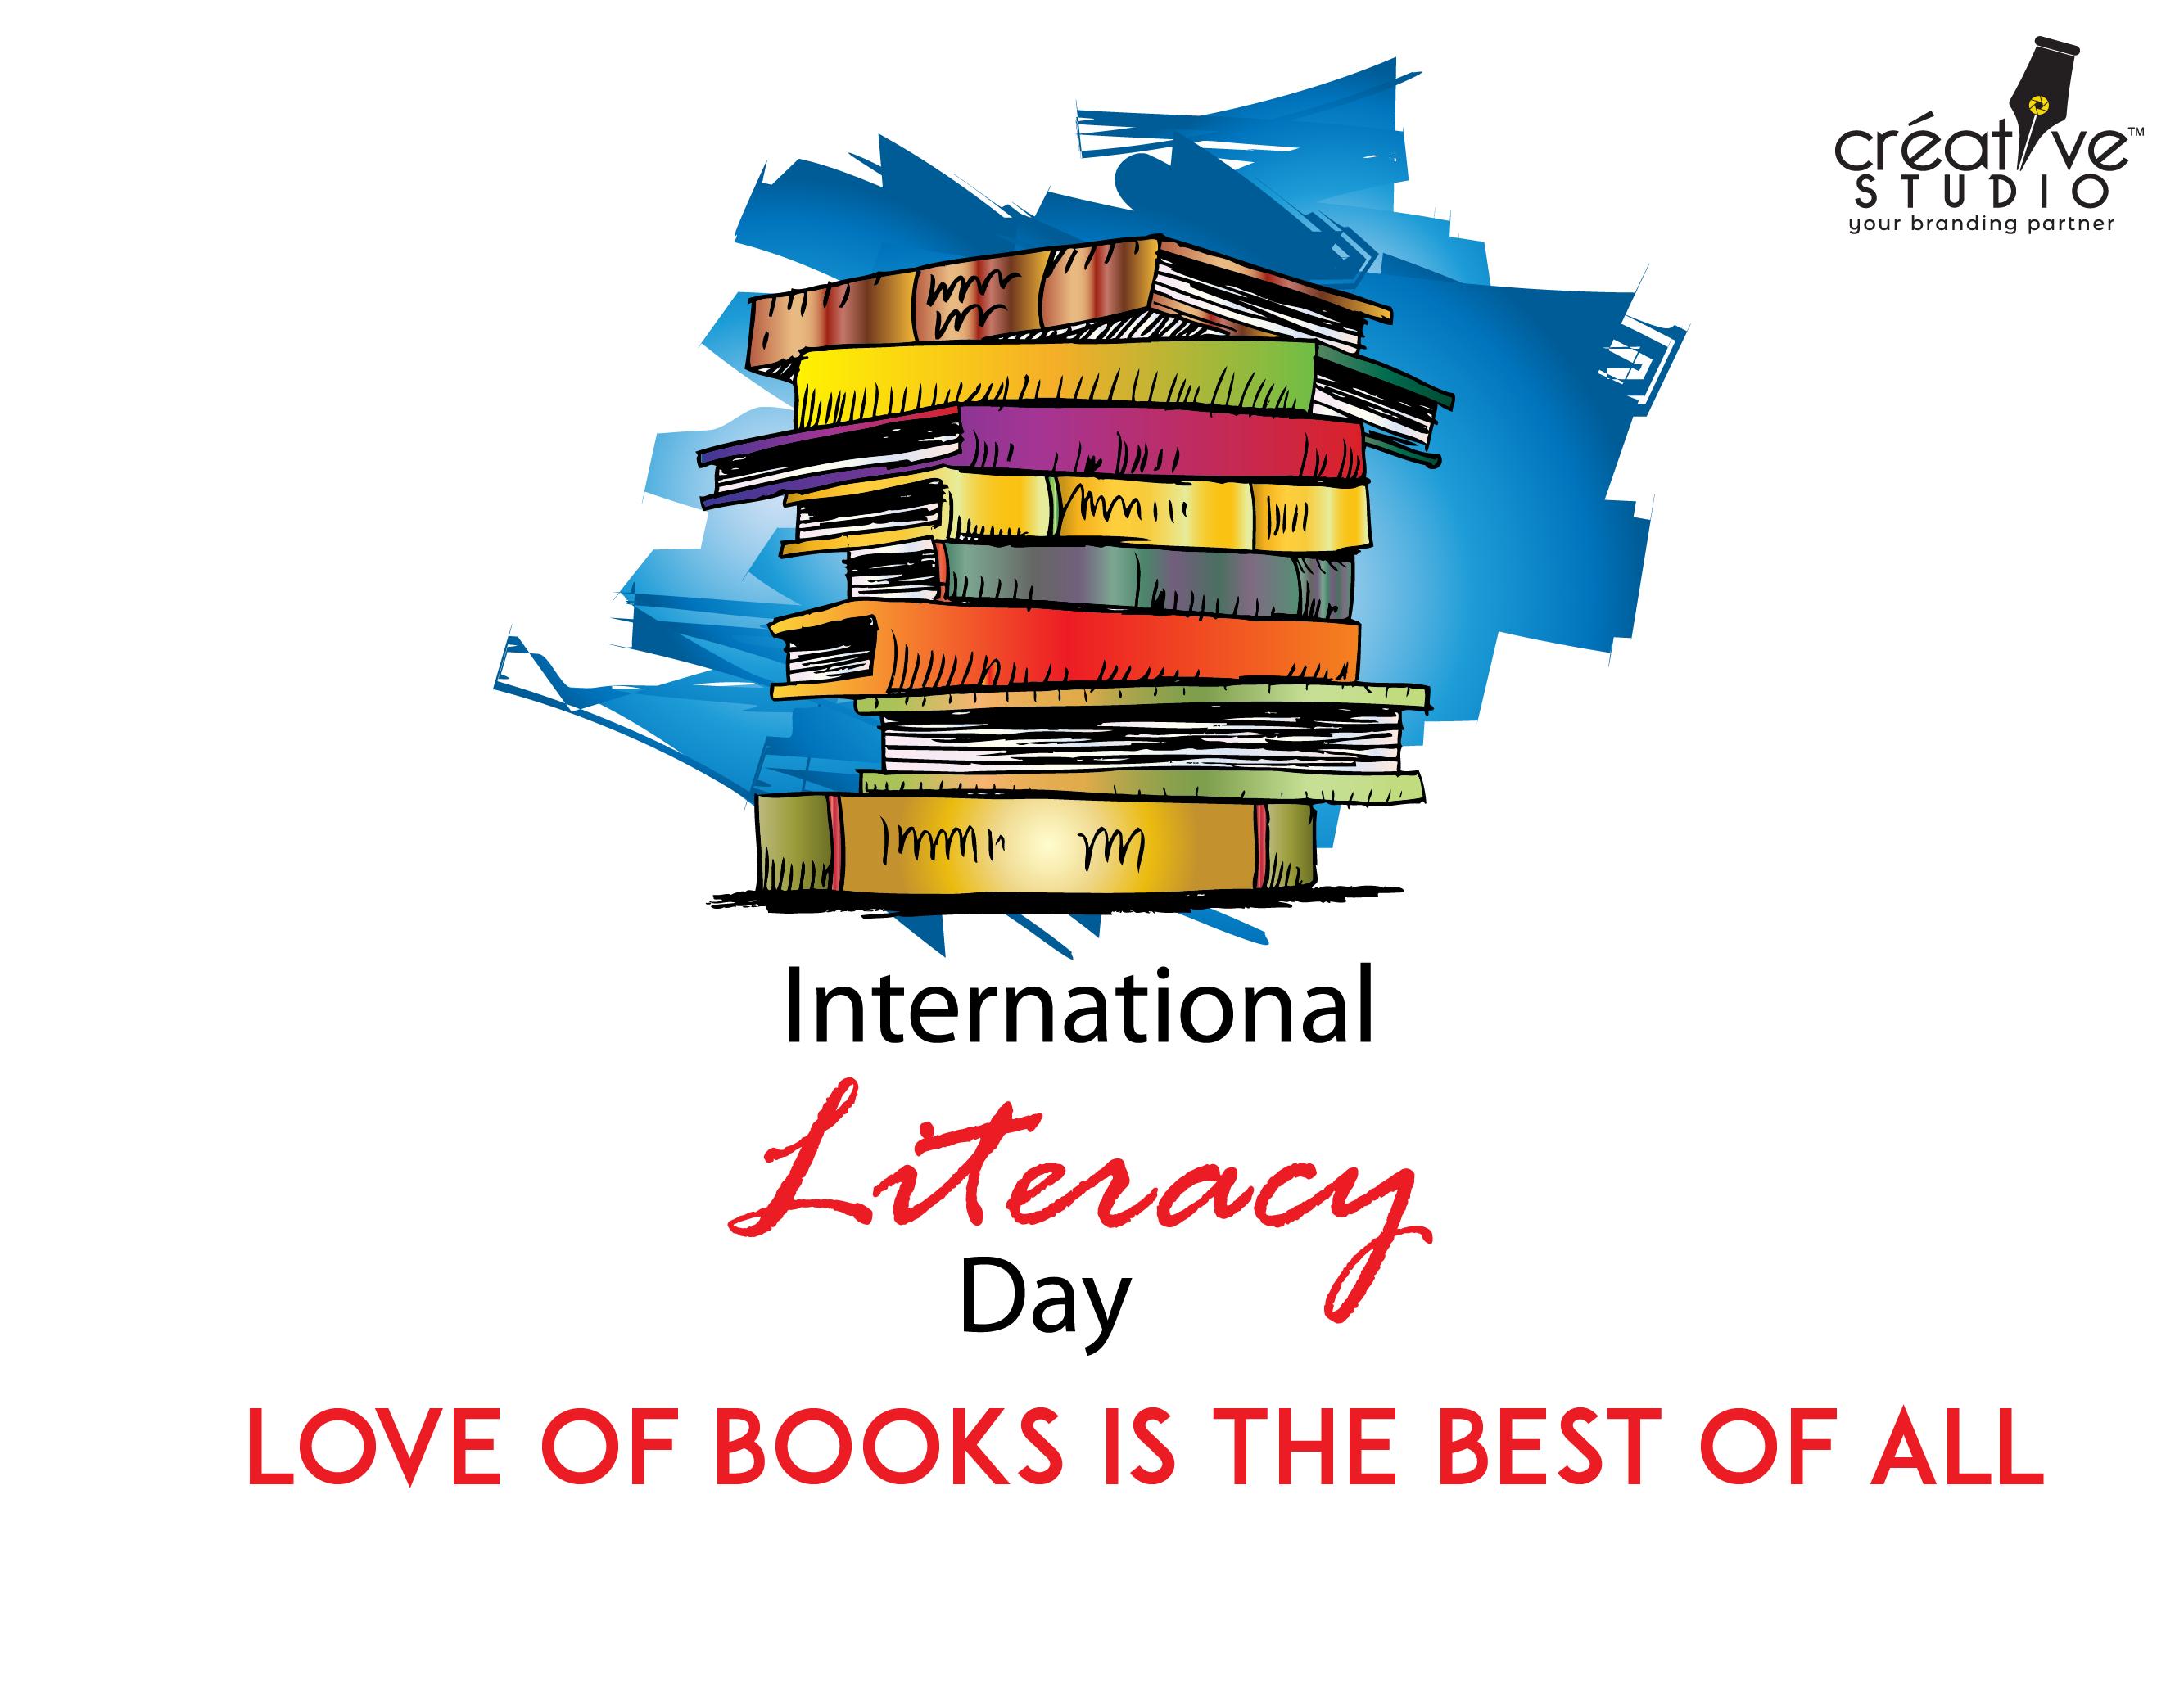 LITERACY DAY 01 - Literacy Day